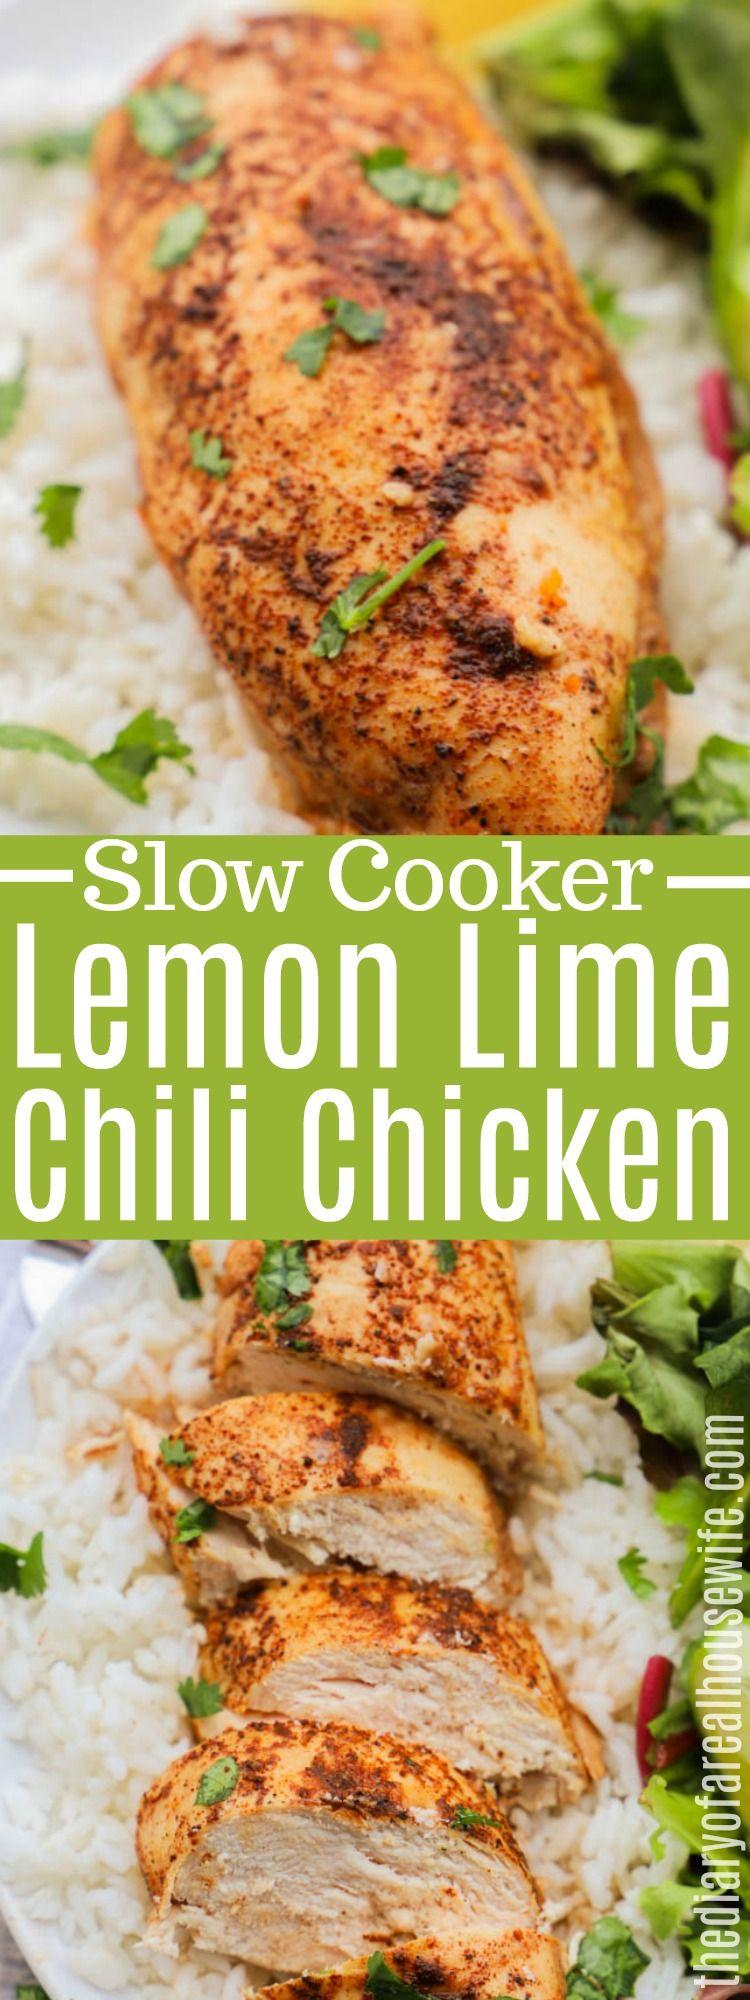 Easy and amazing Slow Cooker Lemon Lime Chili Chicken #slowcooker #chicken #slowcookerchicken